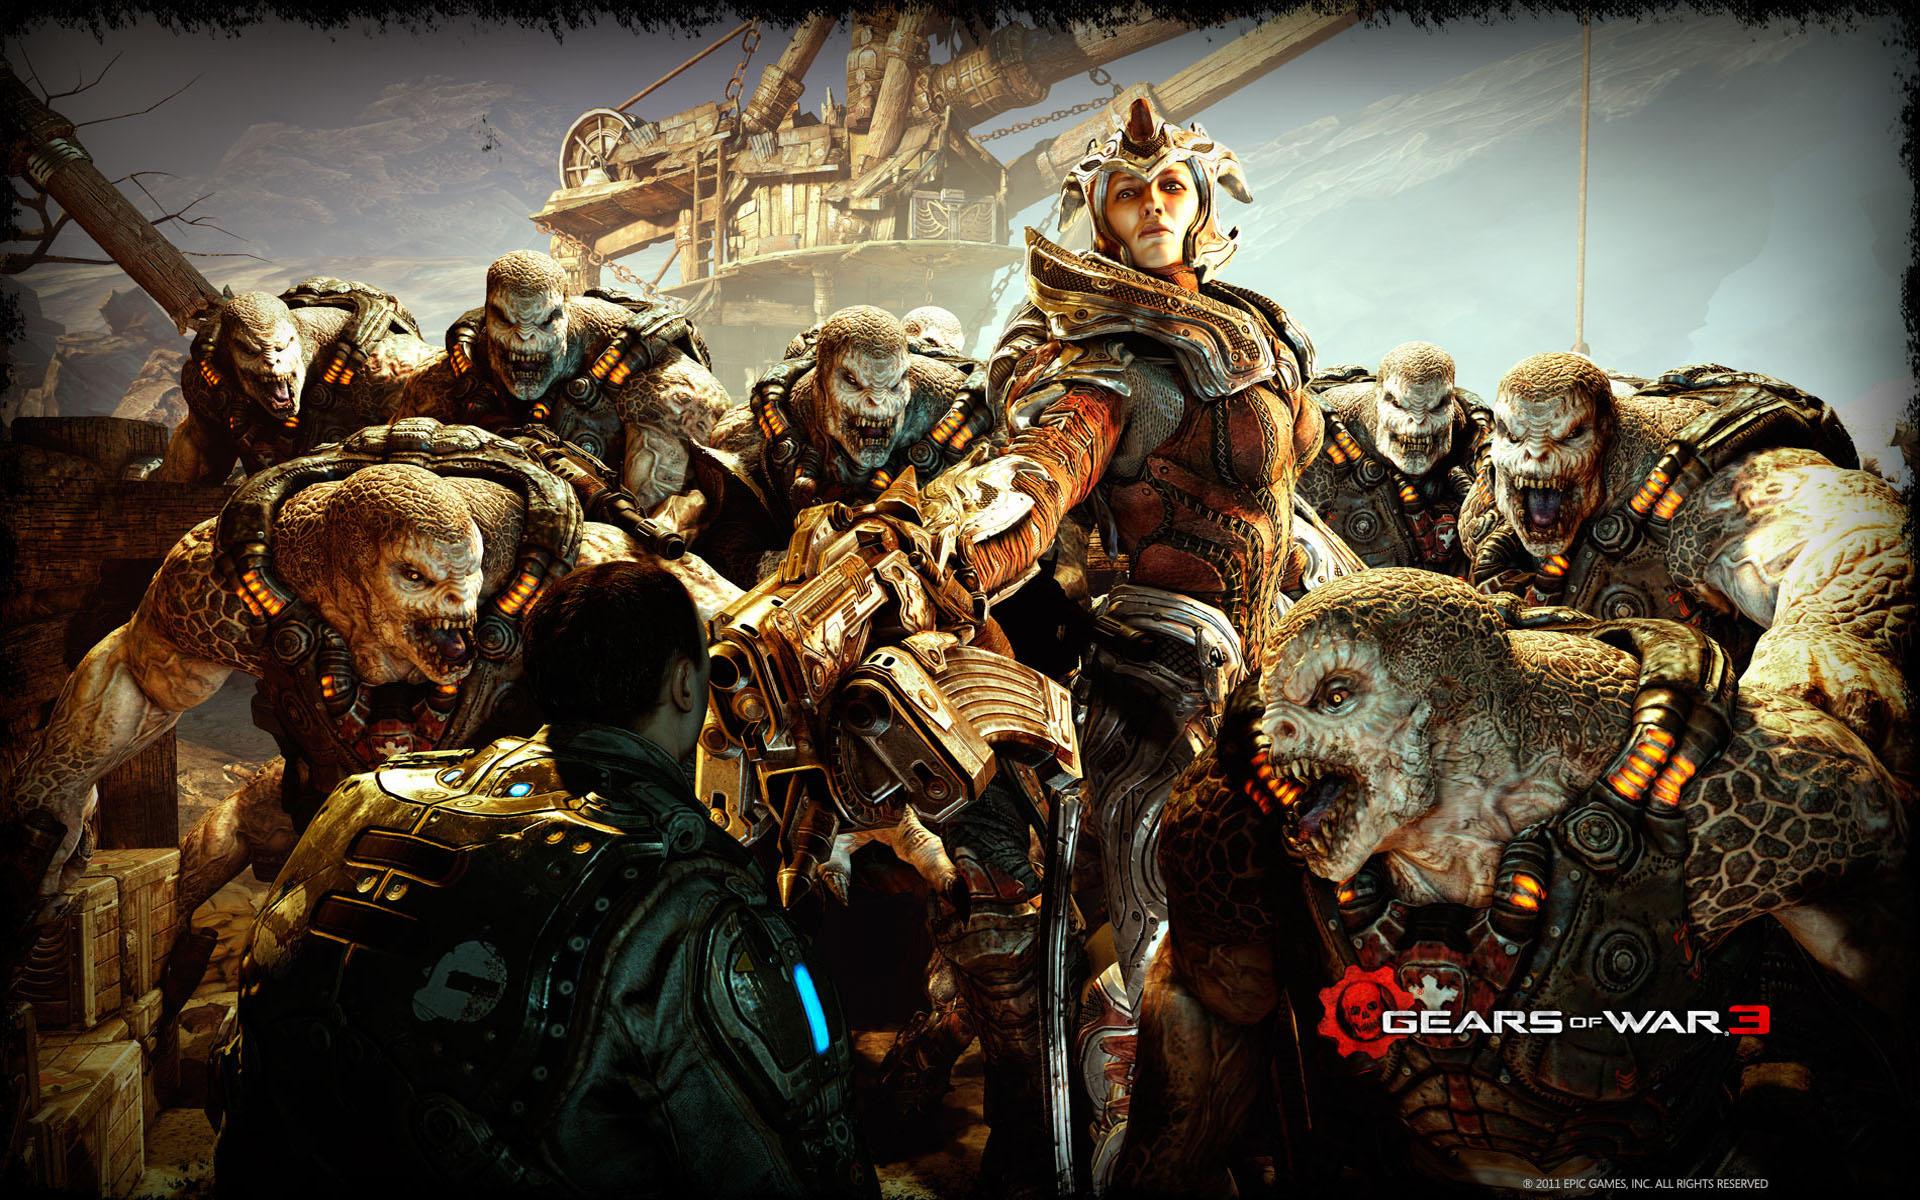 http://3.bp.blogspot.com/-PPaoaQlIo7M/ToHxmaQ7vMI/AAAAAAAAZfY/zcN_FduBdEg/d/Gears+of+War+3+Wallpapers+1920x1200+%25283%2529.jpg